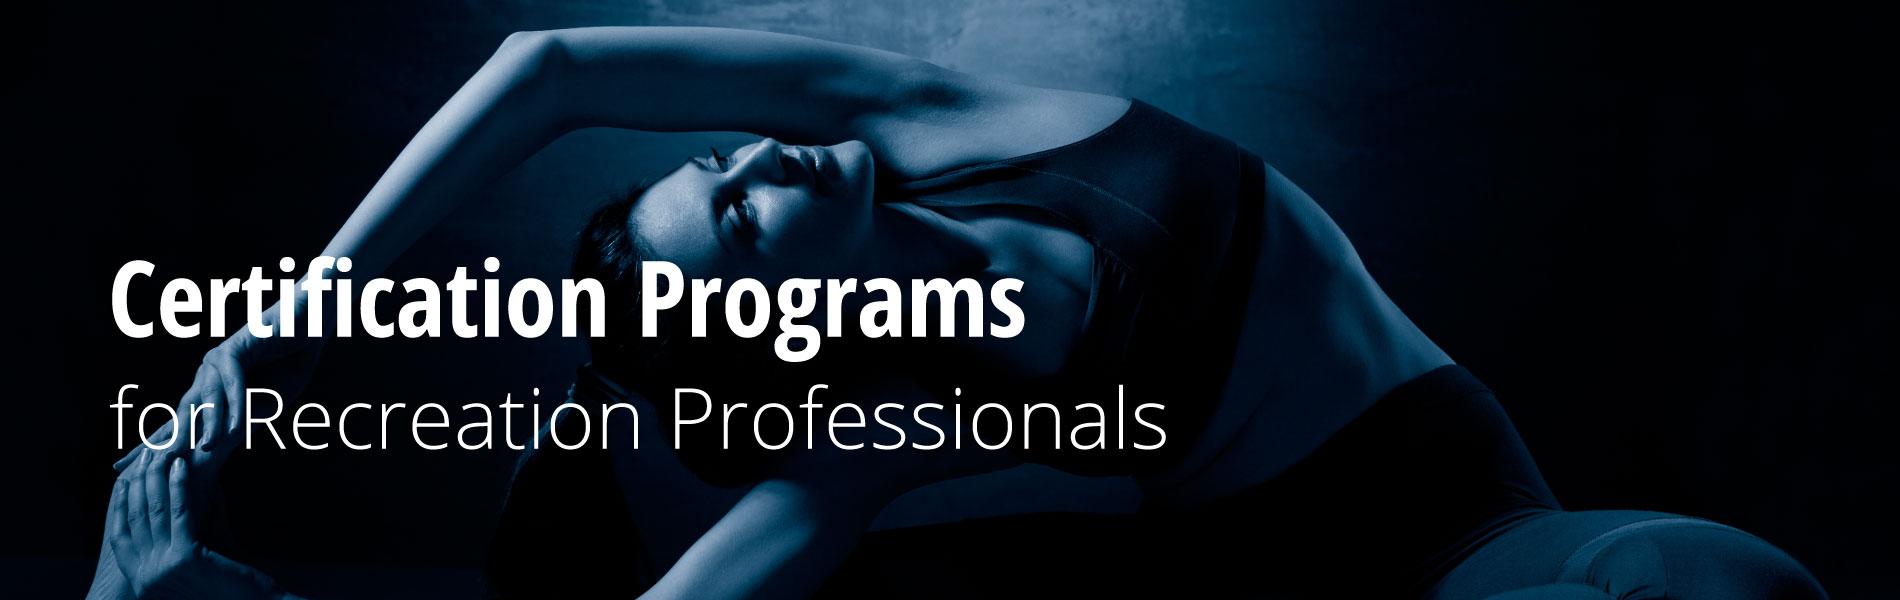 certificationprograms-1900x600.jpg